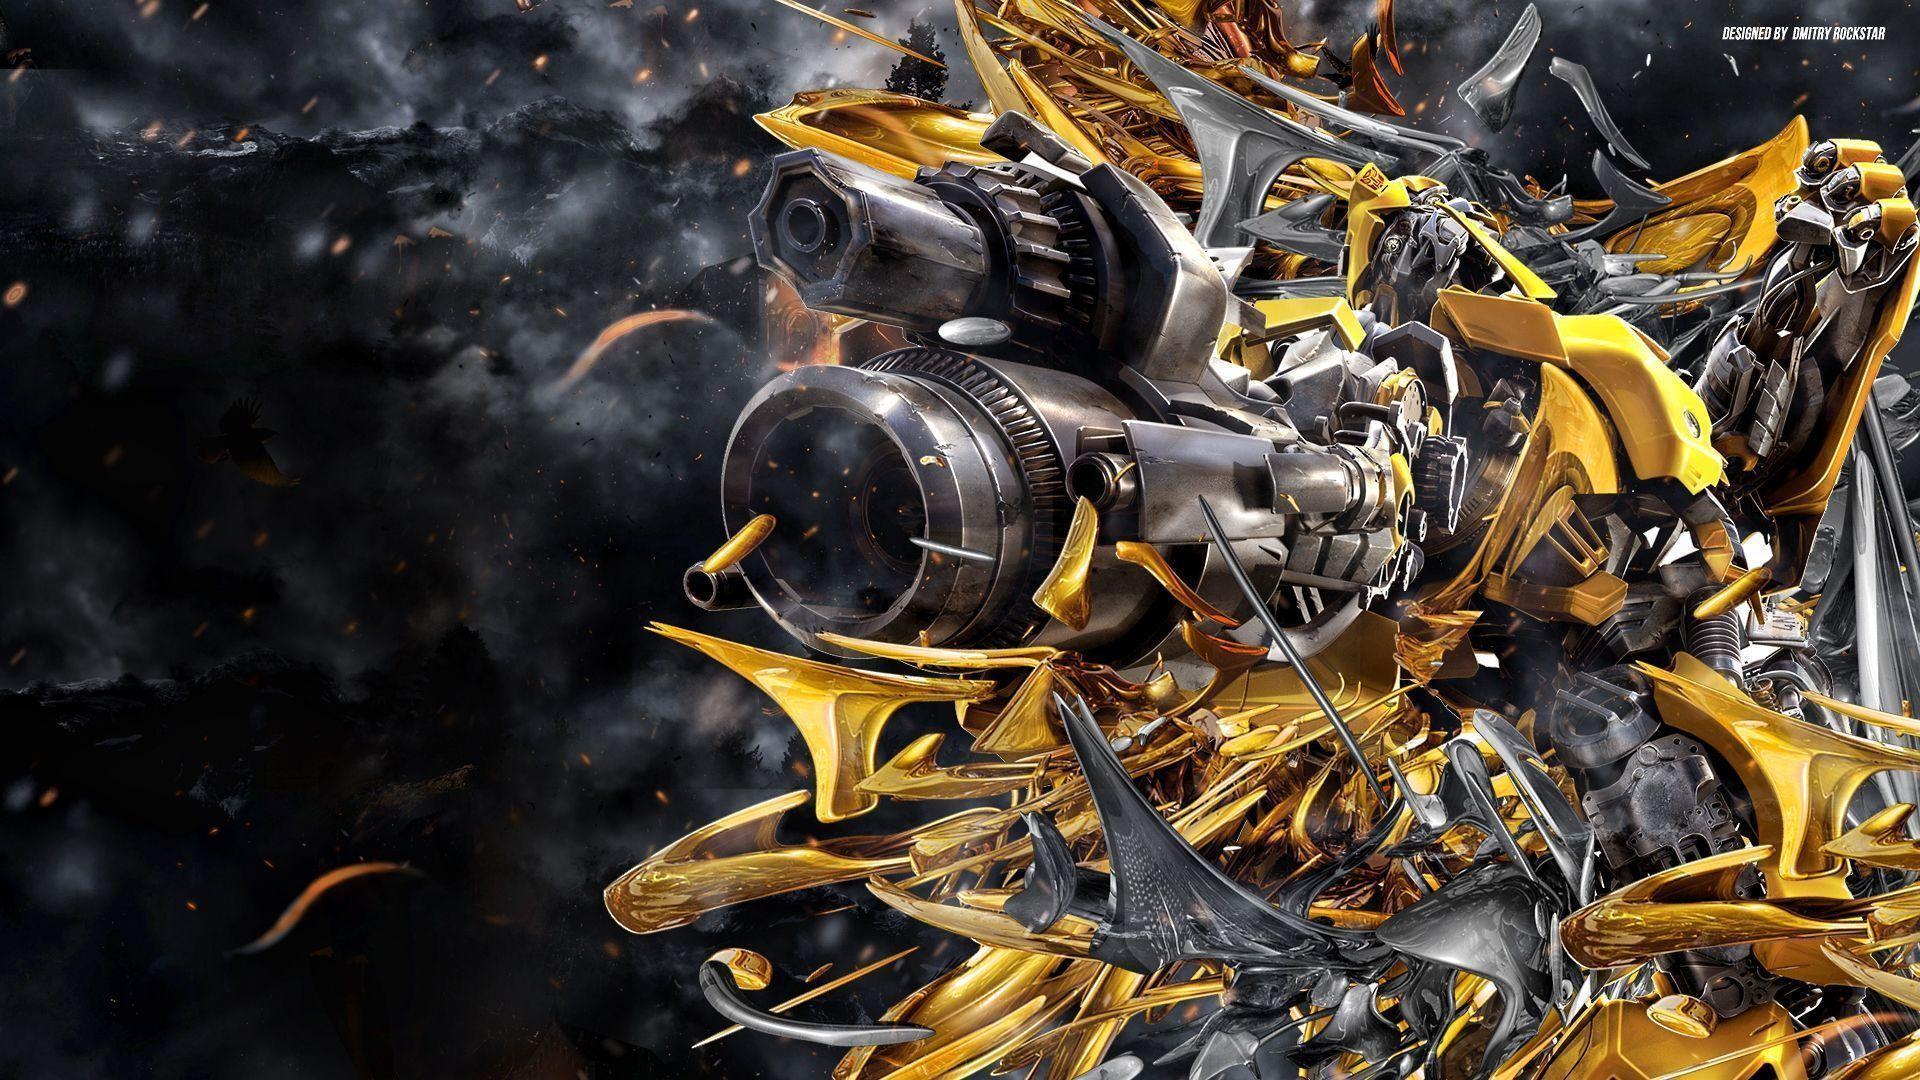 Transformers Wallpaper Hd Widescreen Bumblebee 2018 Wallpaper Hd 66 Images